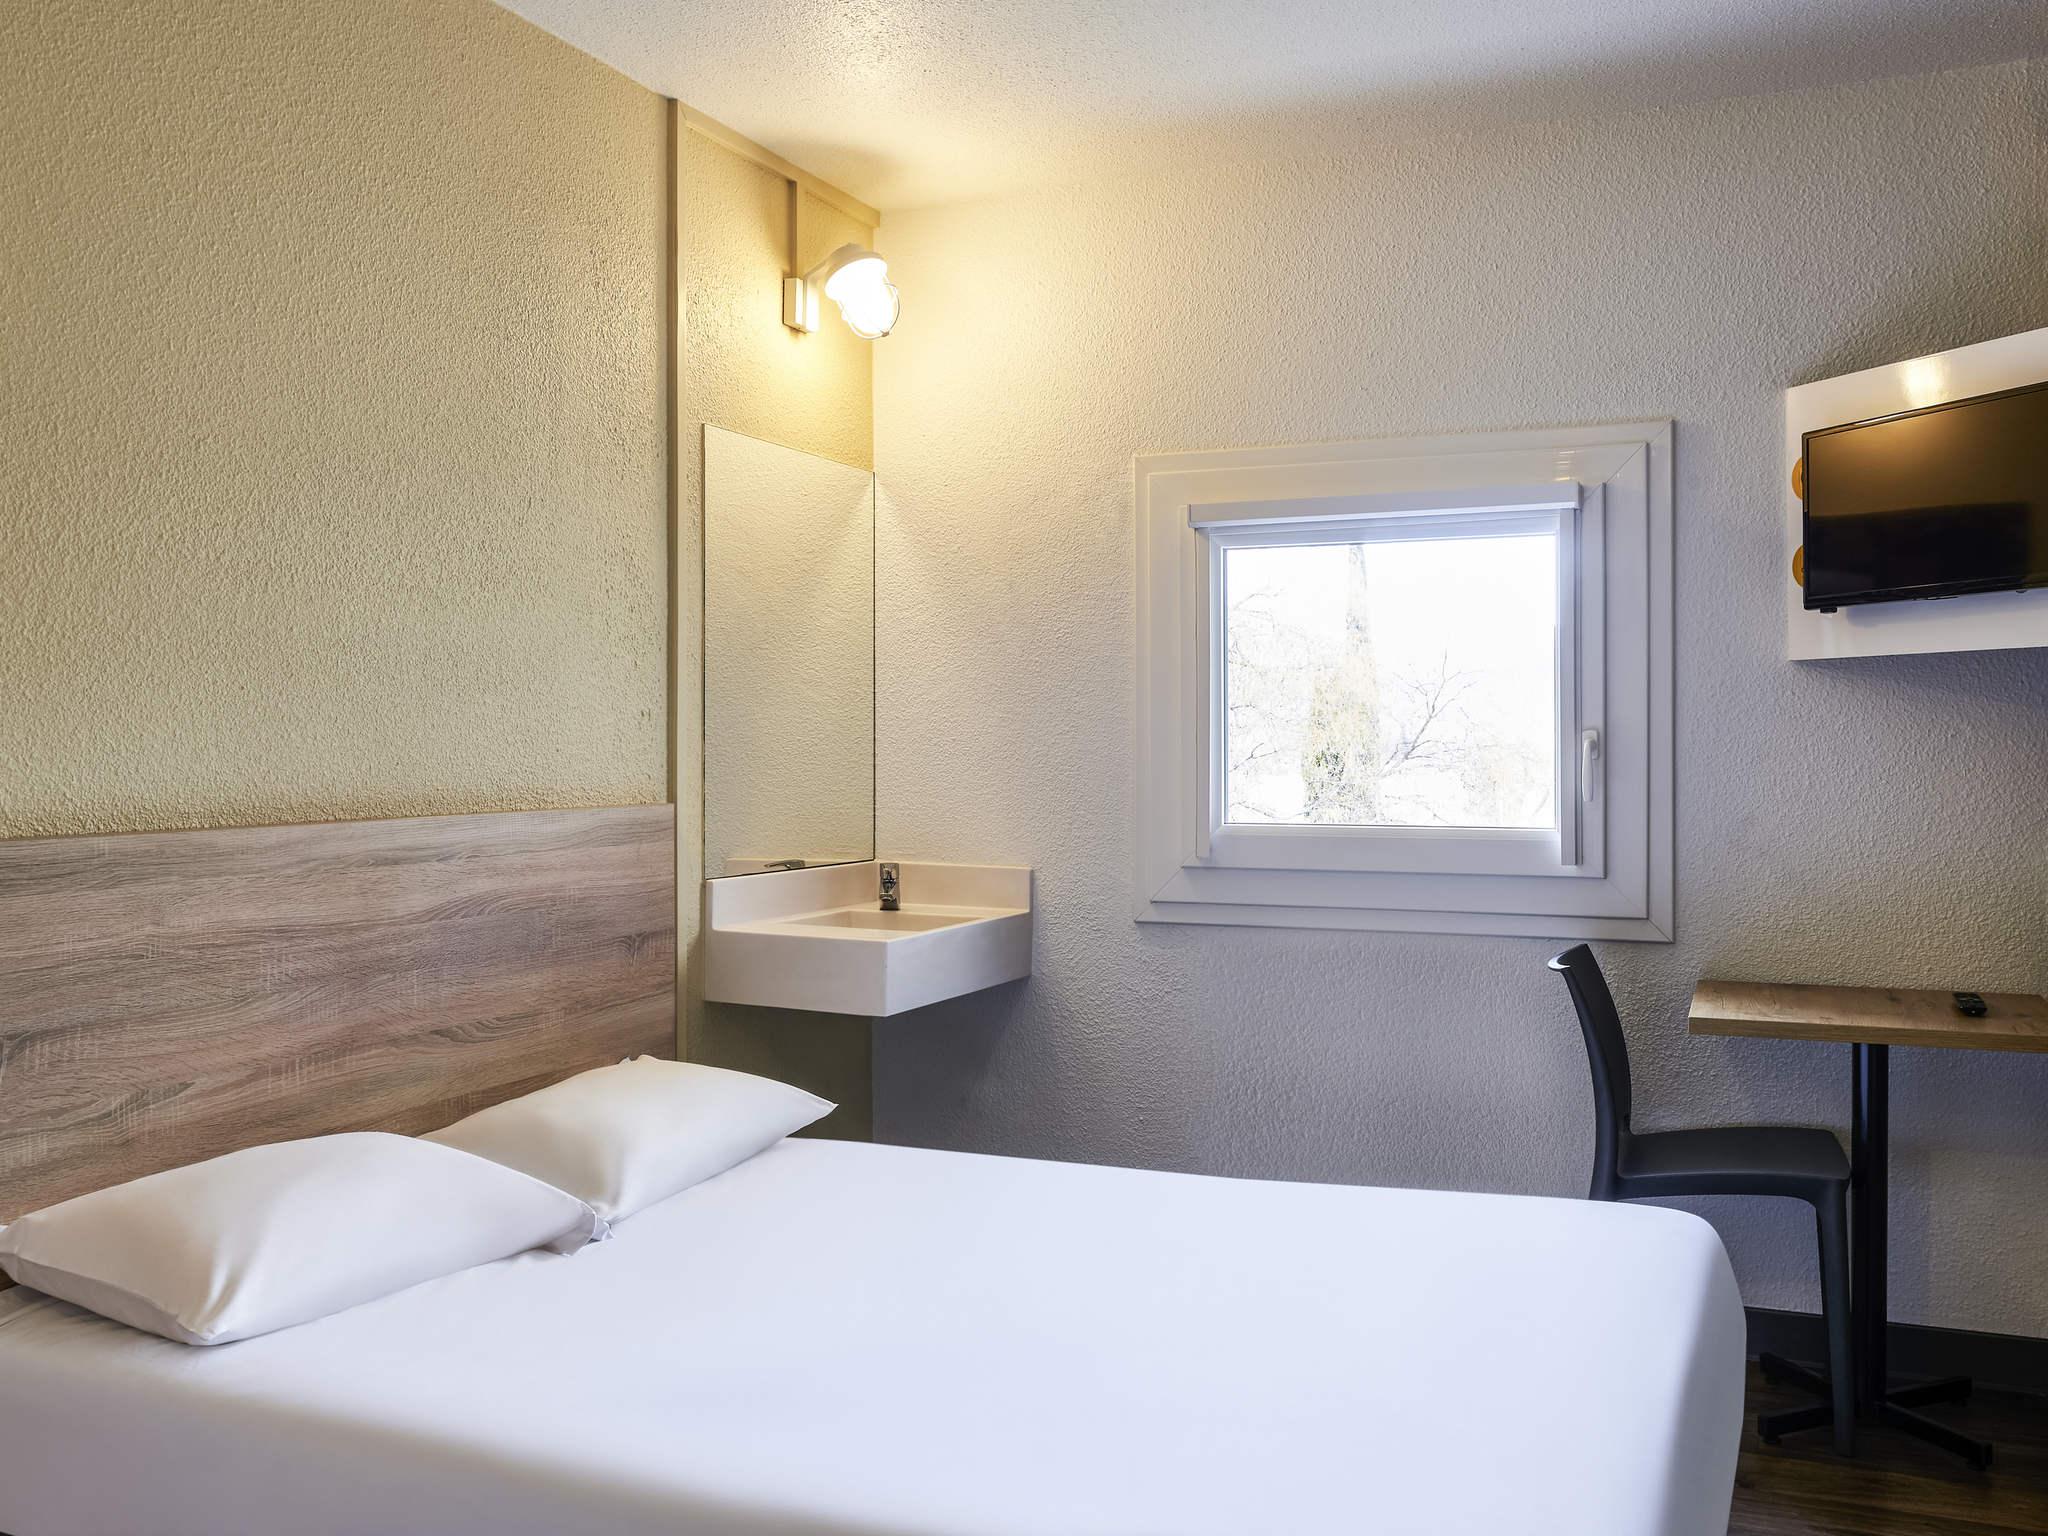 Htel MARSEILLE HotelF1 Marseille La Valentine Rnov